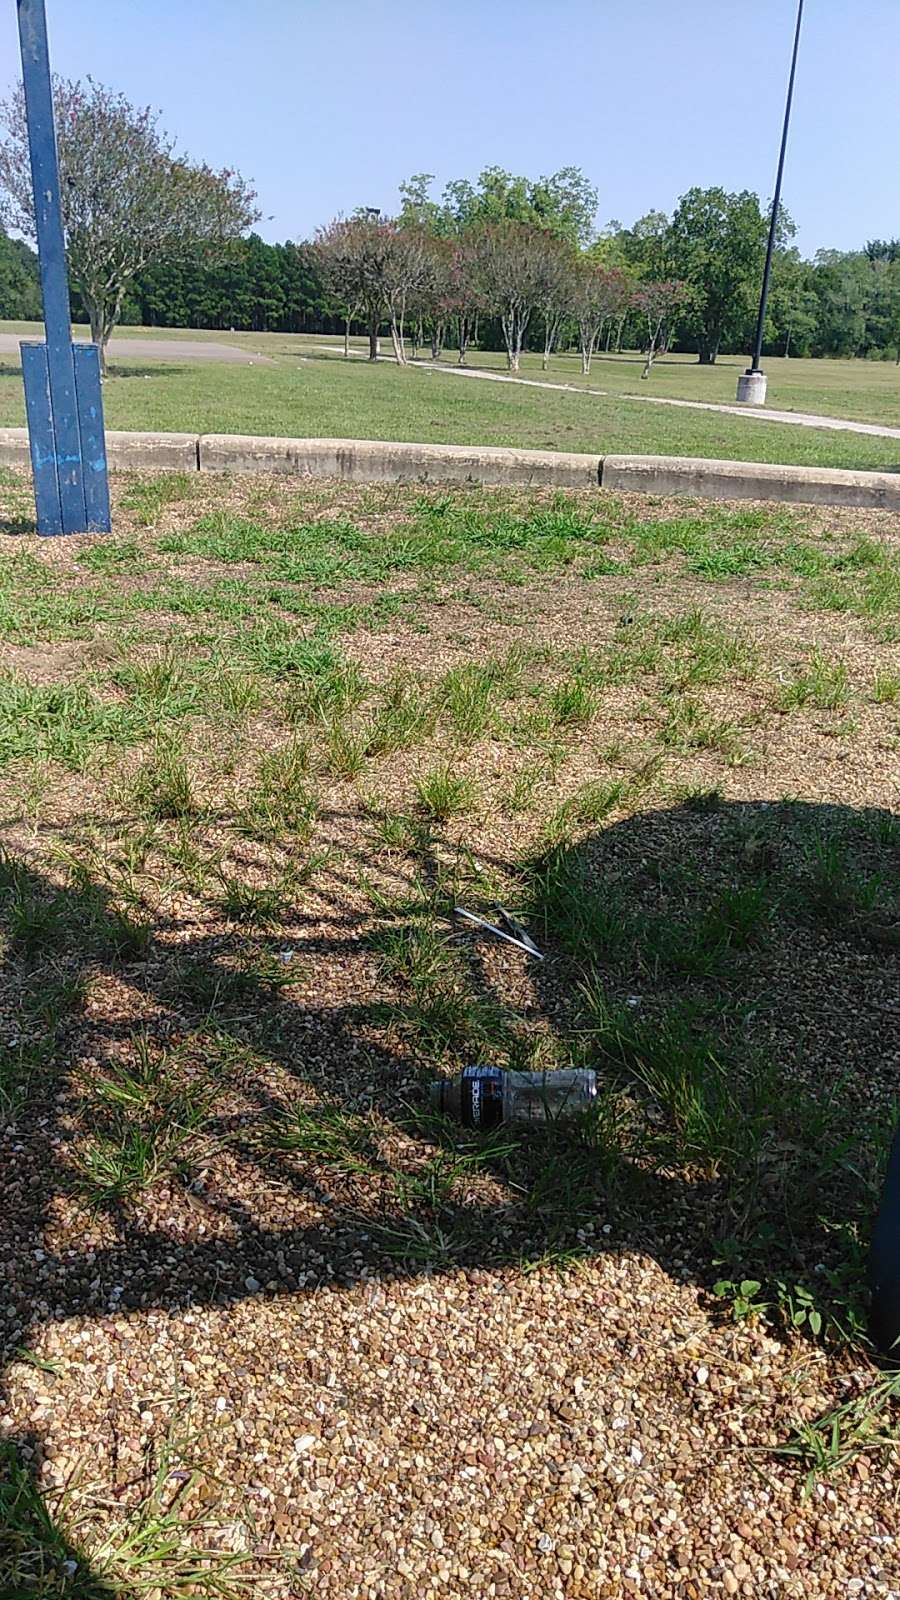 F.M. Park - park  | Photo 2 of 10 | Address: 6100 Vasser Rd, Houston, TX 77033, USA